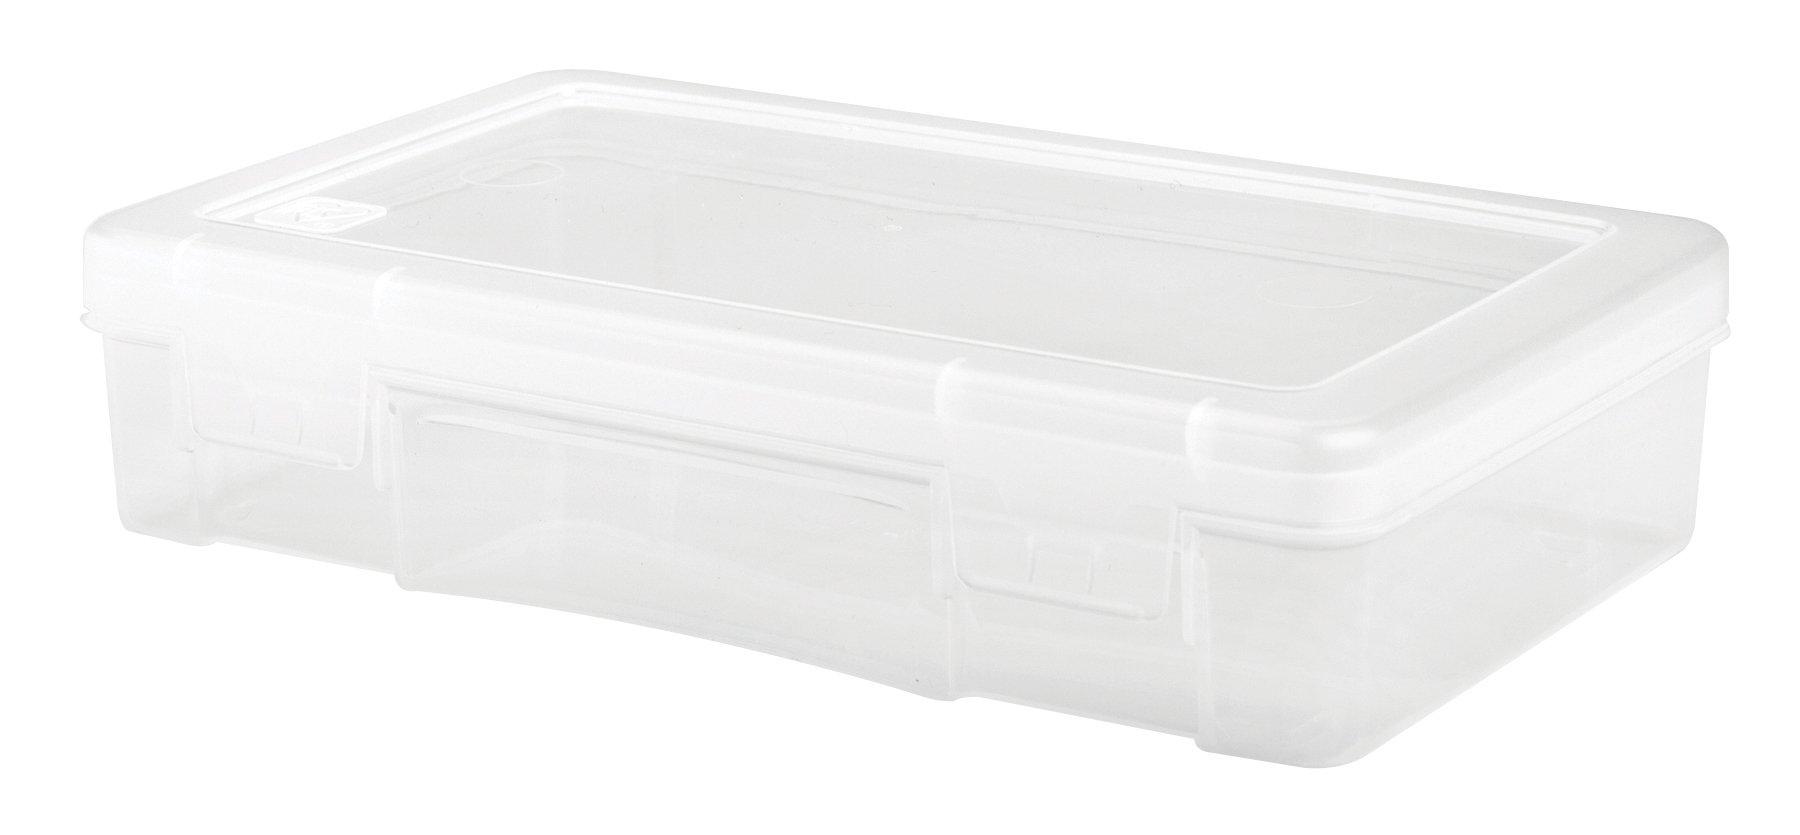 IRIS Medium Modular Supply Case, 10 Pack by IRIS USA, Inc.